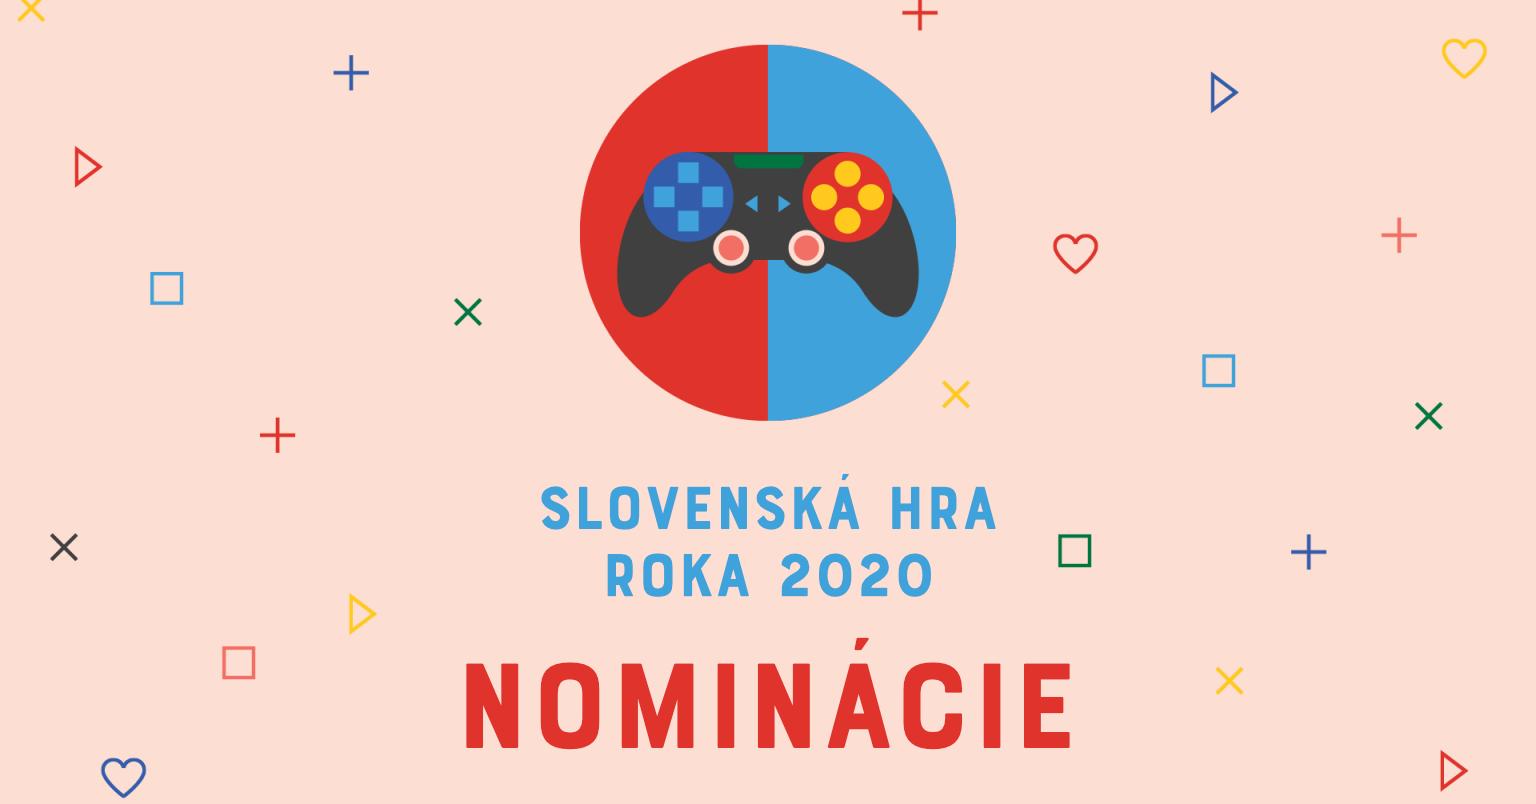 SK hra 2020 shortlist